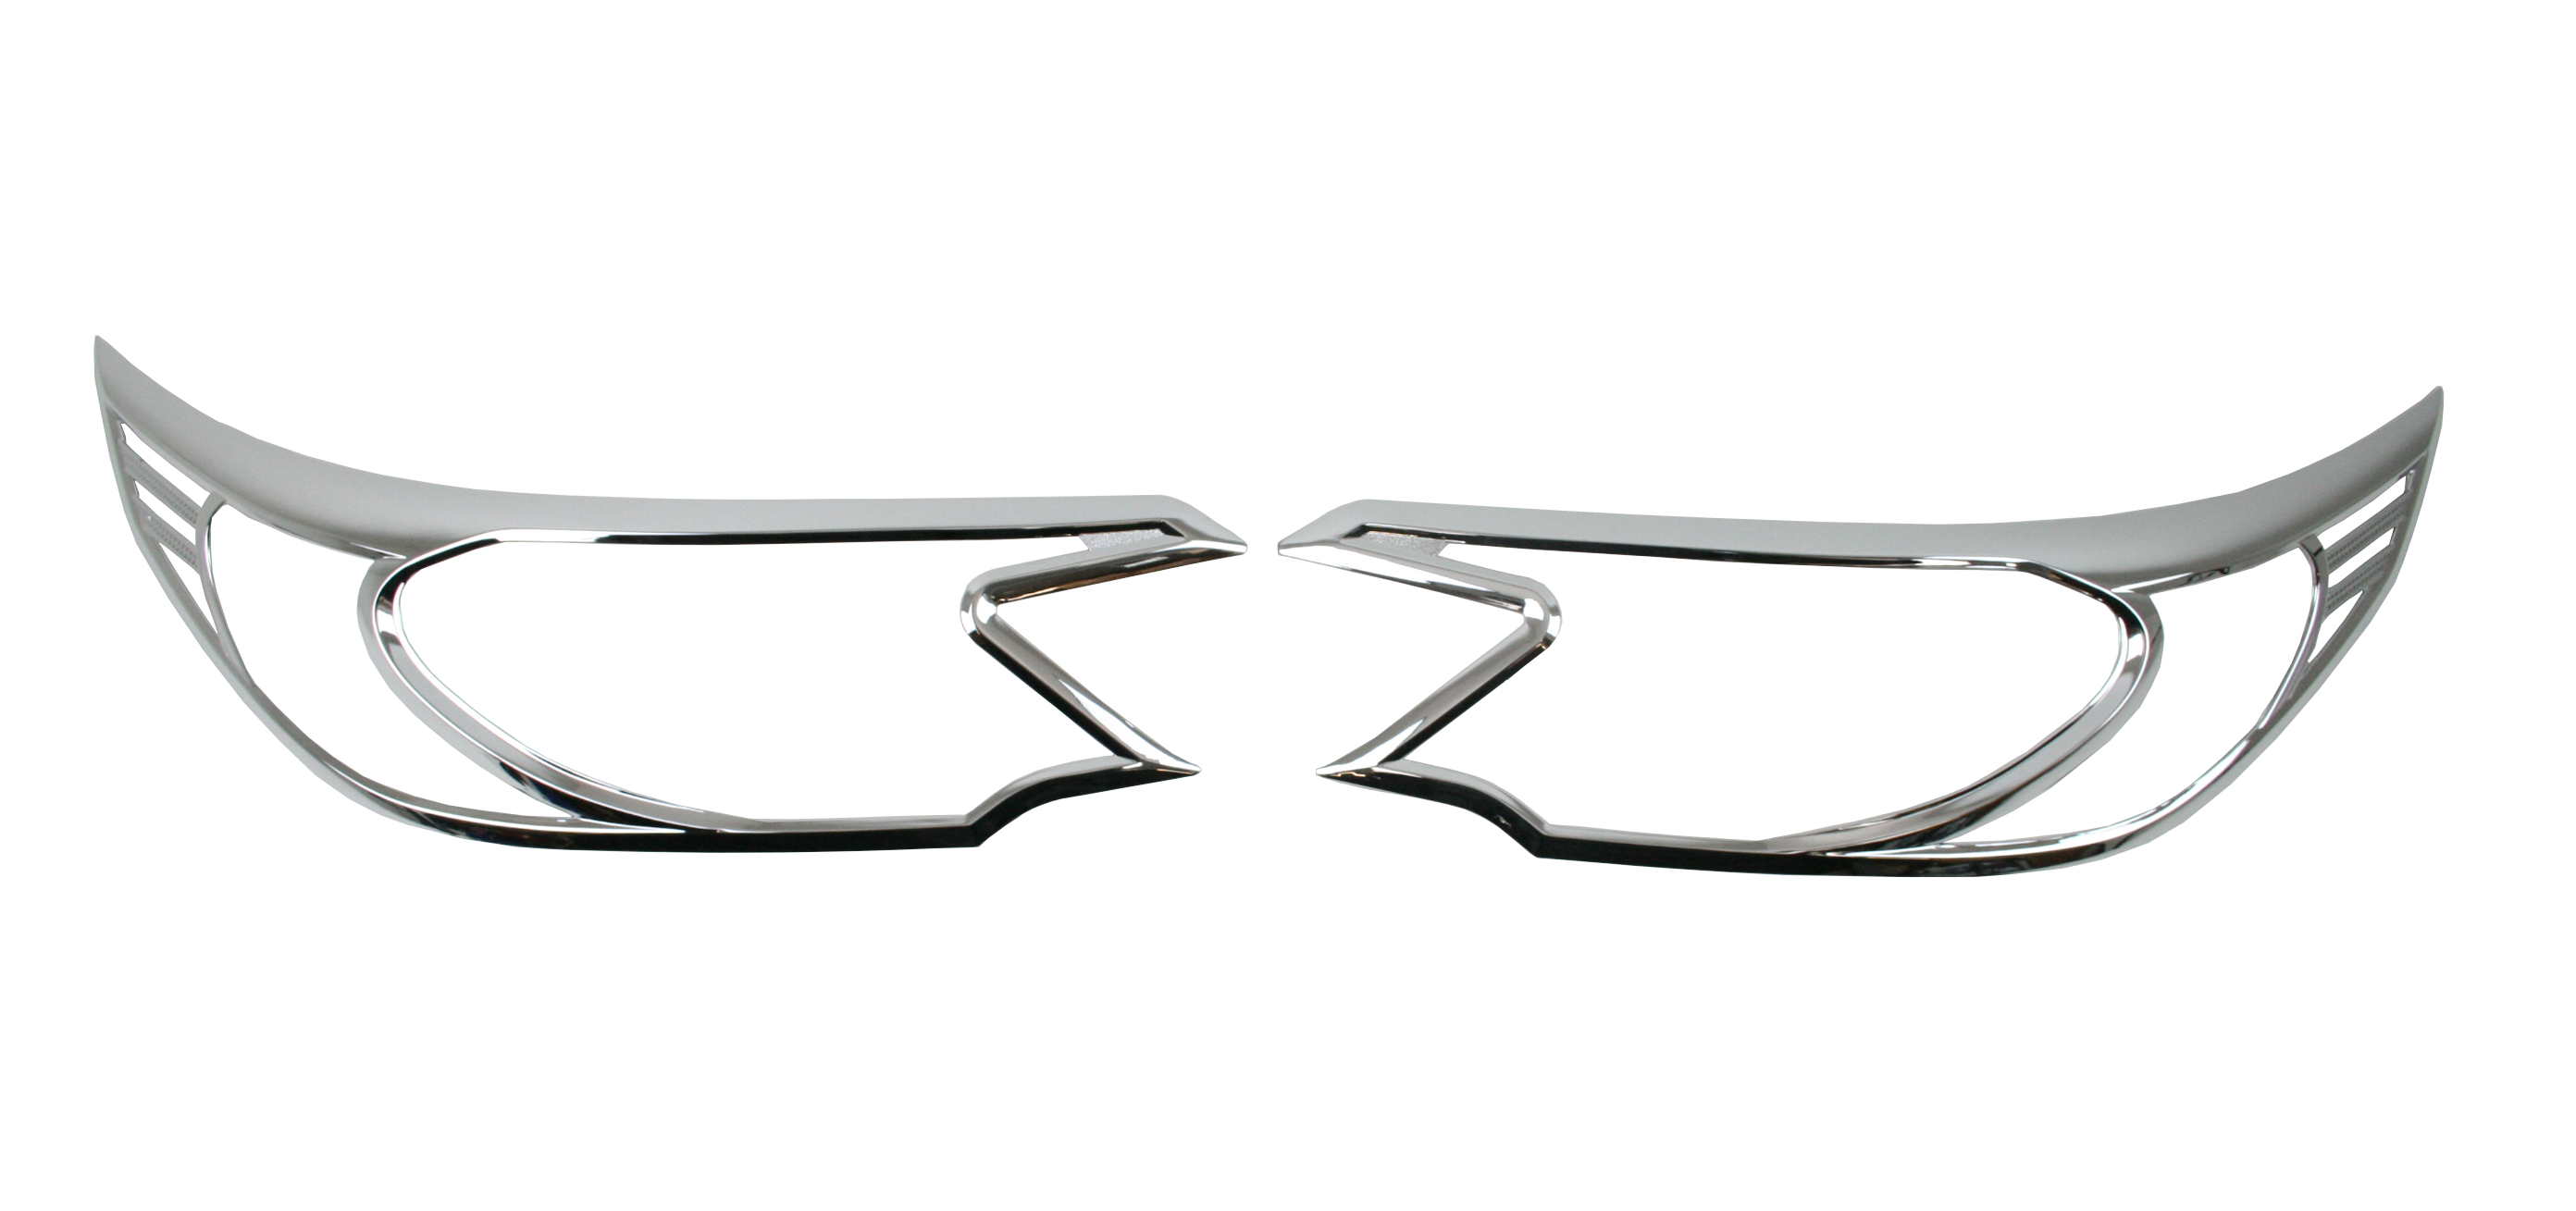 Toyota Celica Headlight Wiring Diagram